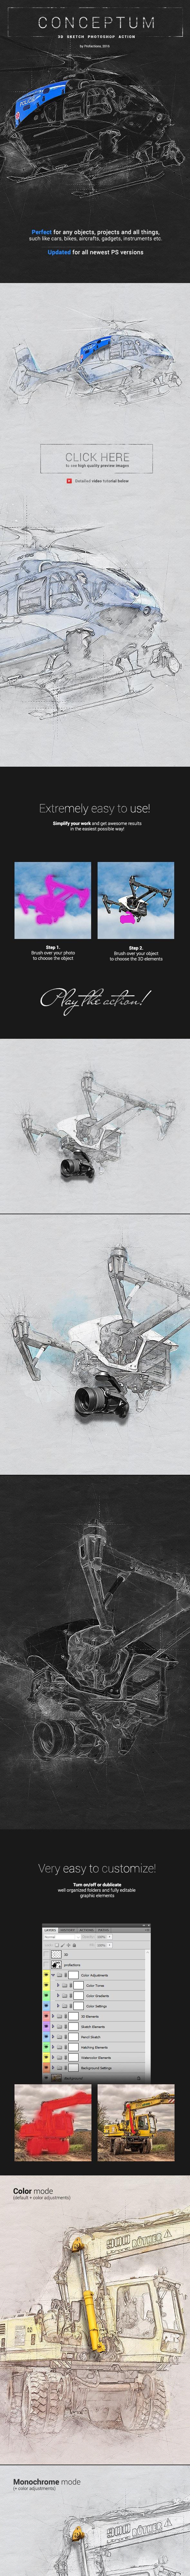 3D Sketch - Conceptum - Photoshop Action - Photo Effects Actions